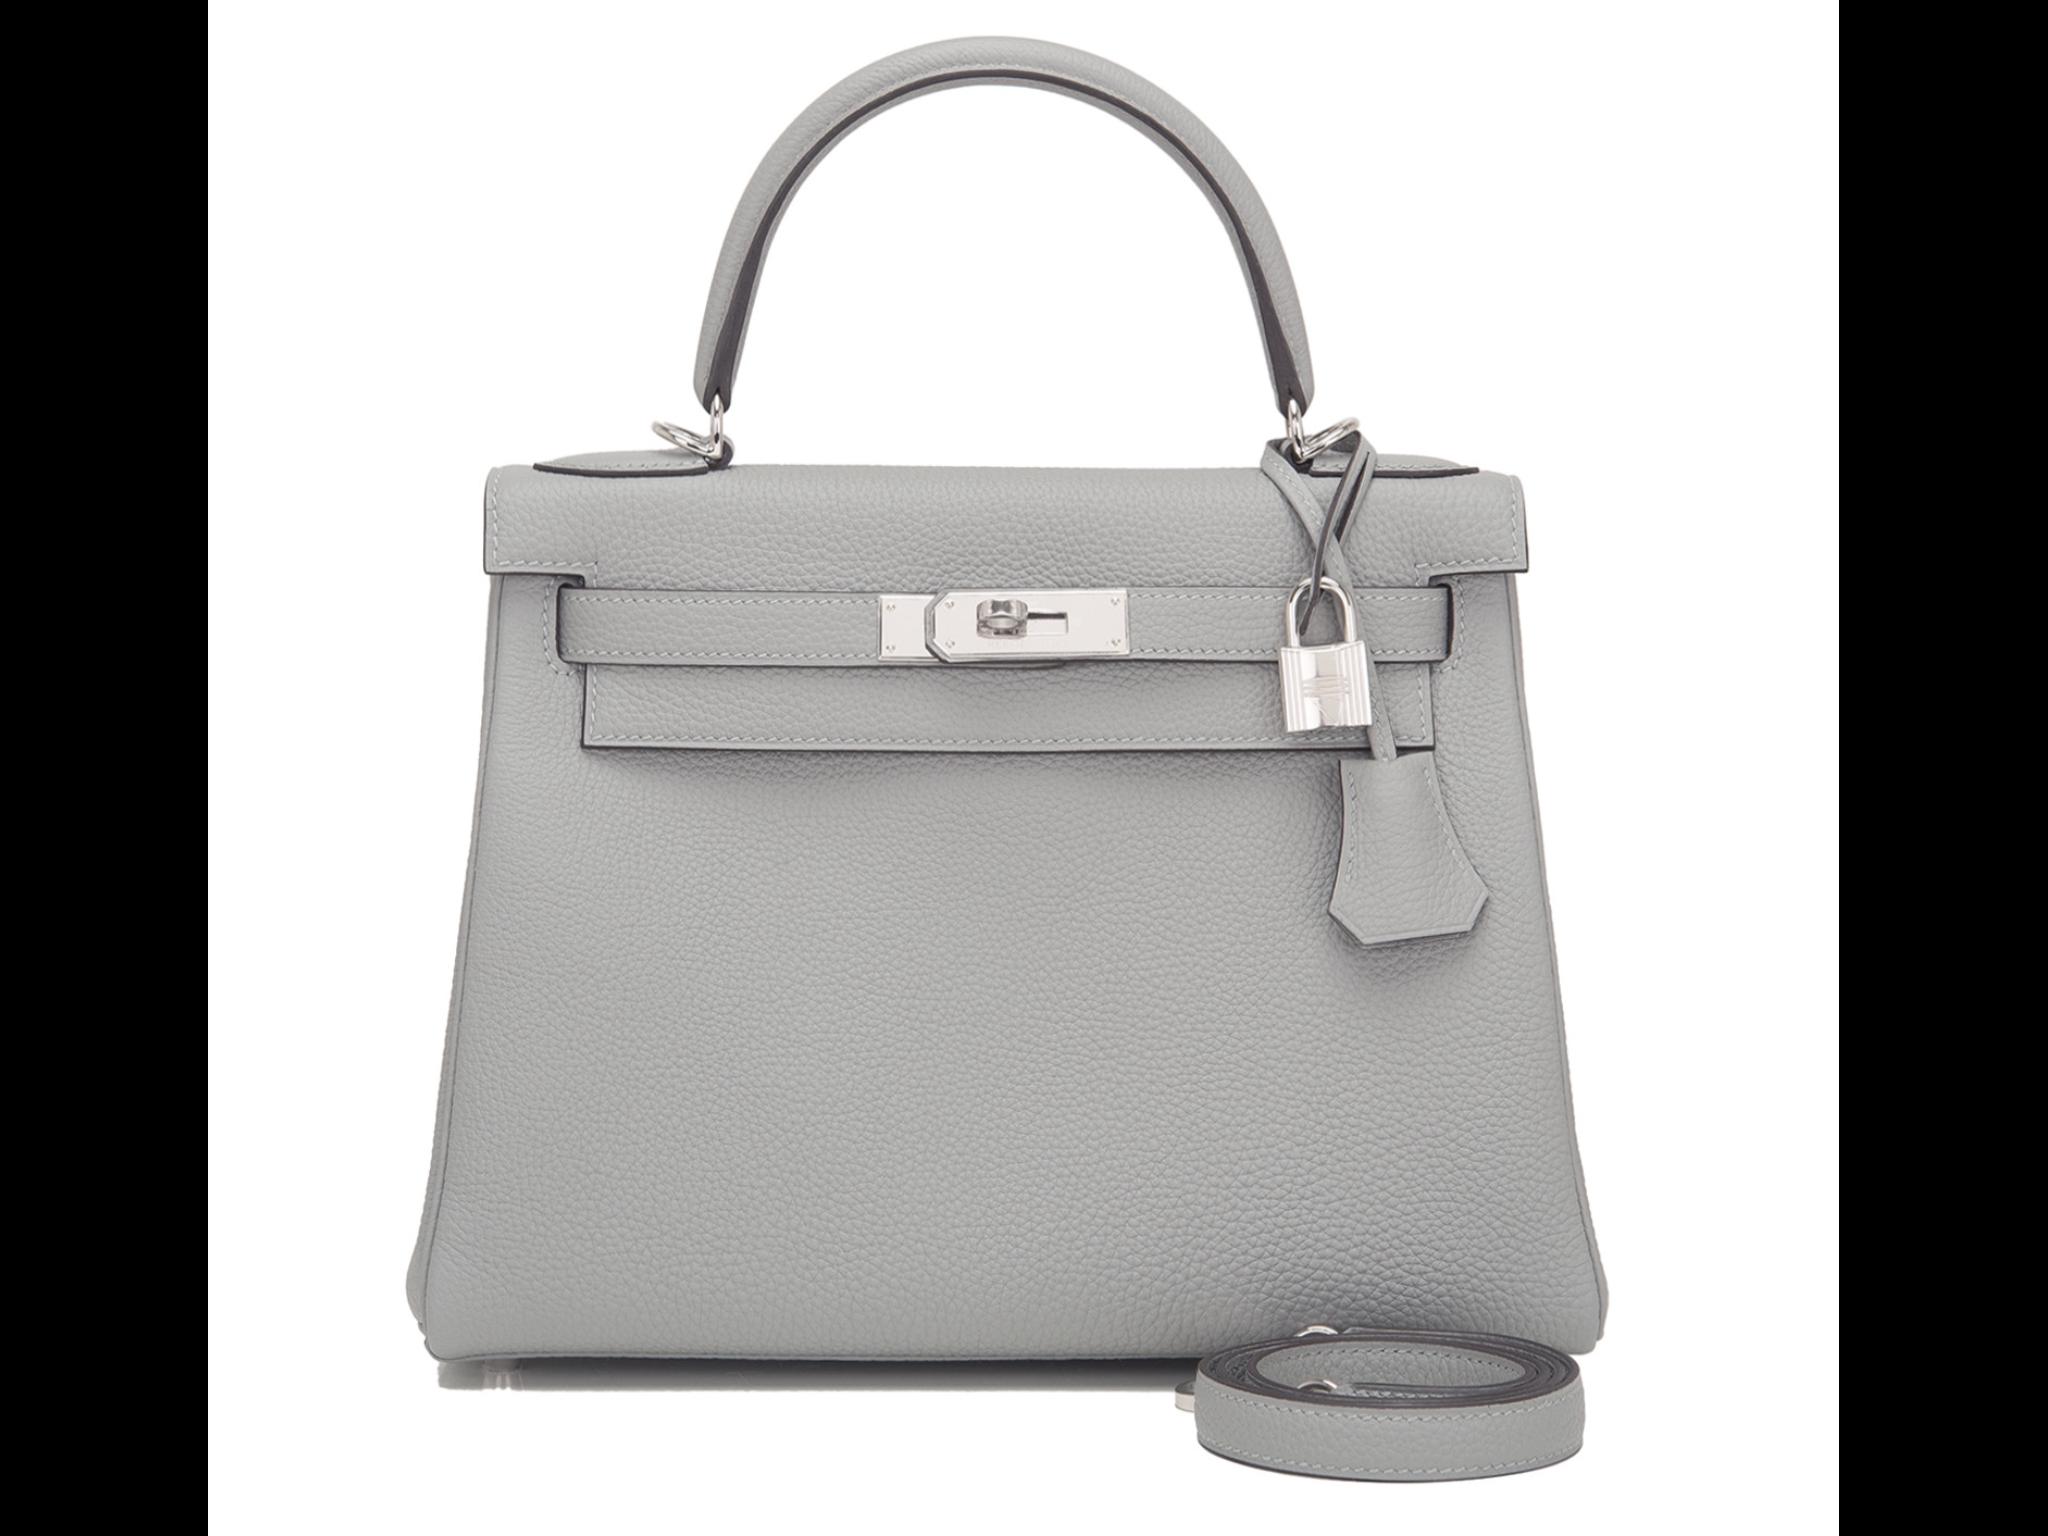 56ac12c44abff ... best price hermes kelly 32cm gris mouette silver hardwear a gorgeous  bag 3b764 8c81f